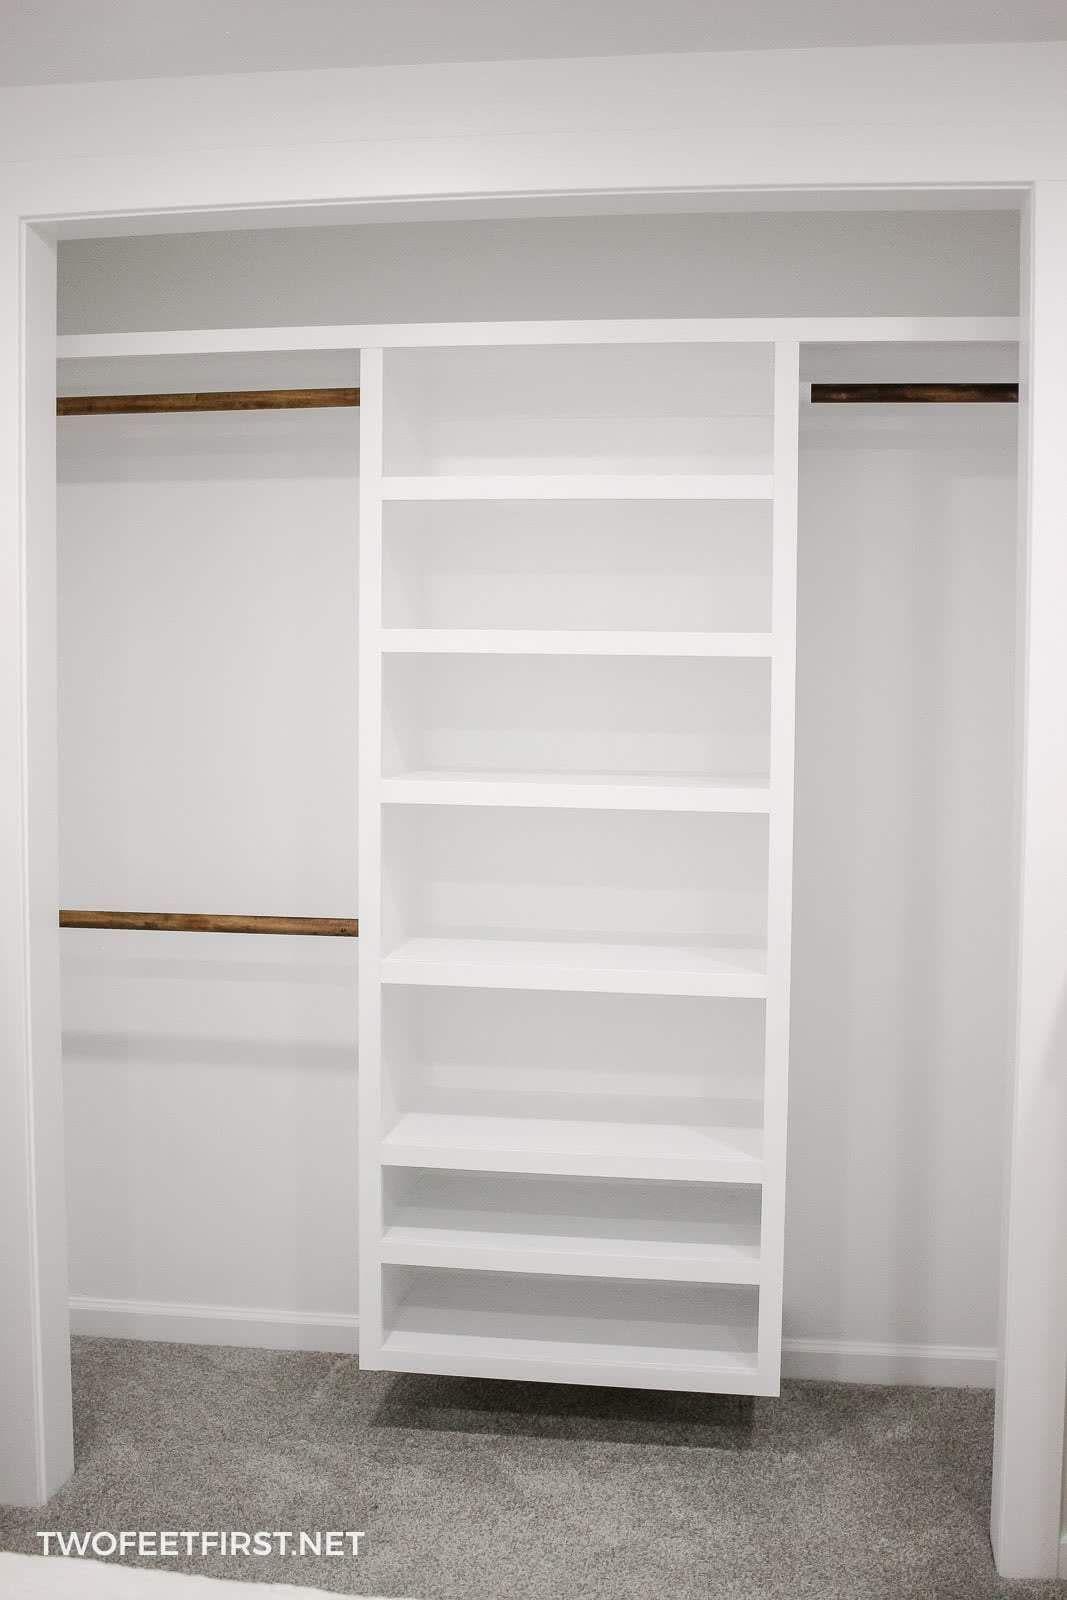 How To Build An Easy Diy Closet Organizer Build To Organize